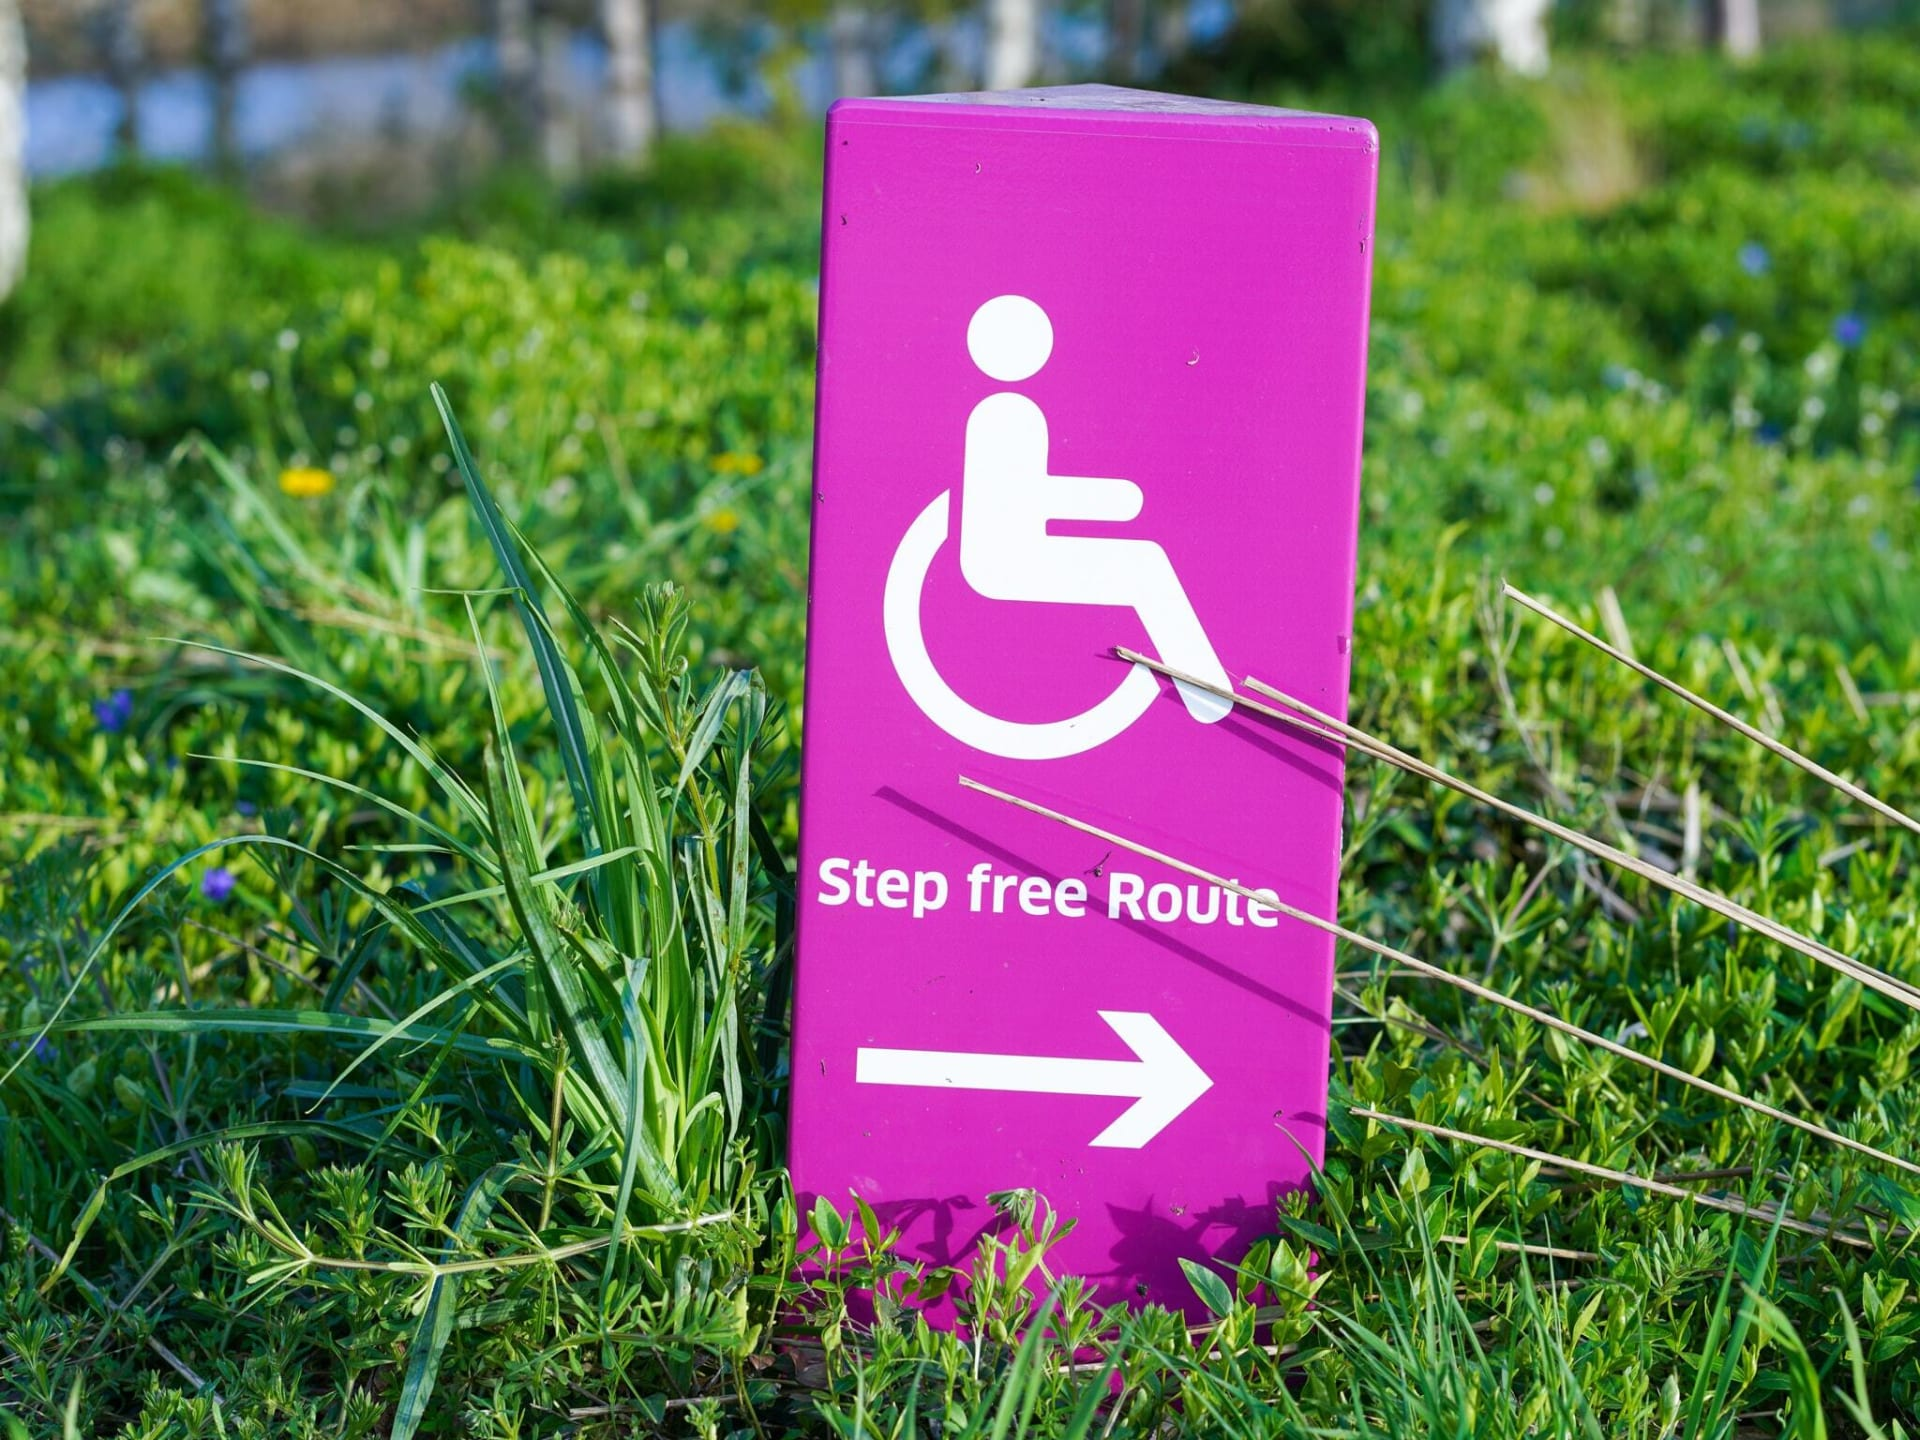 Accessibility visual